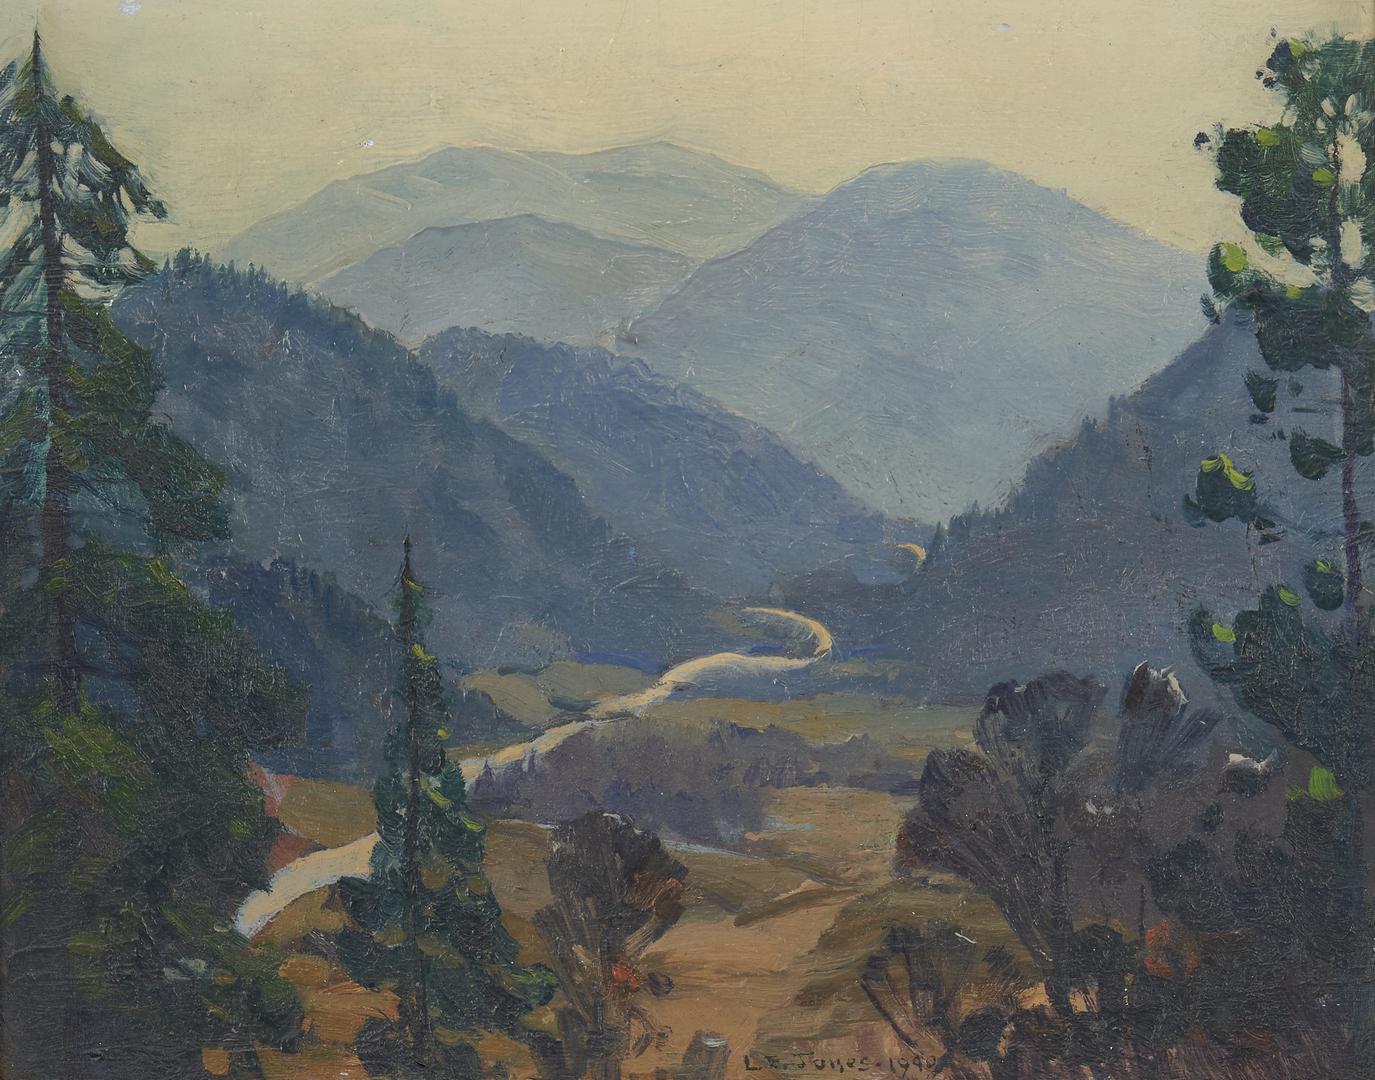 Lot 986: Louis E. Jones O/B Landscape Painting, Great Smoky Mountains